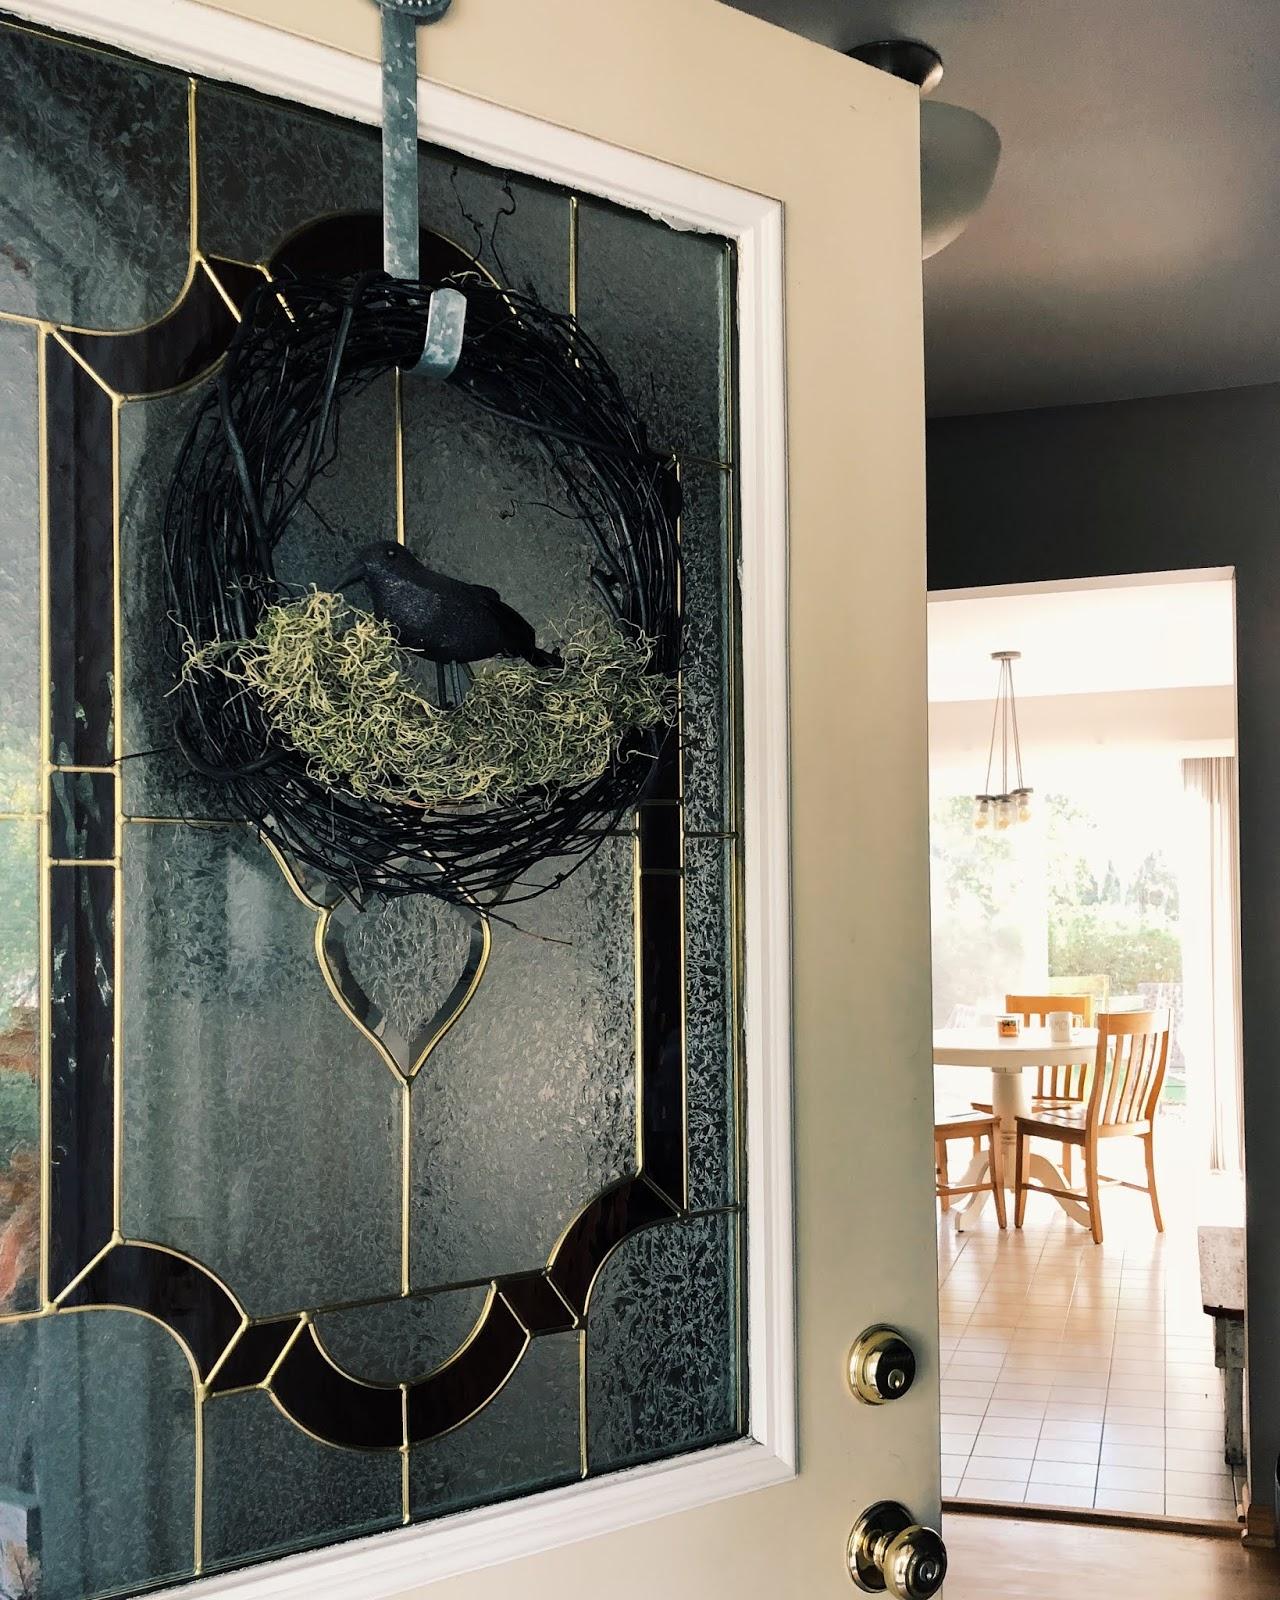 DIY Crow Wreath